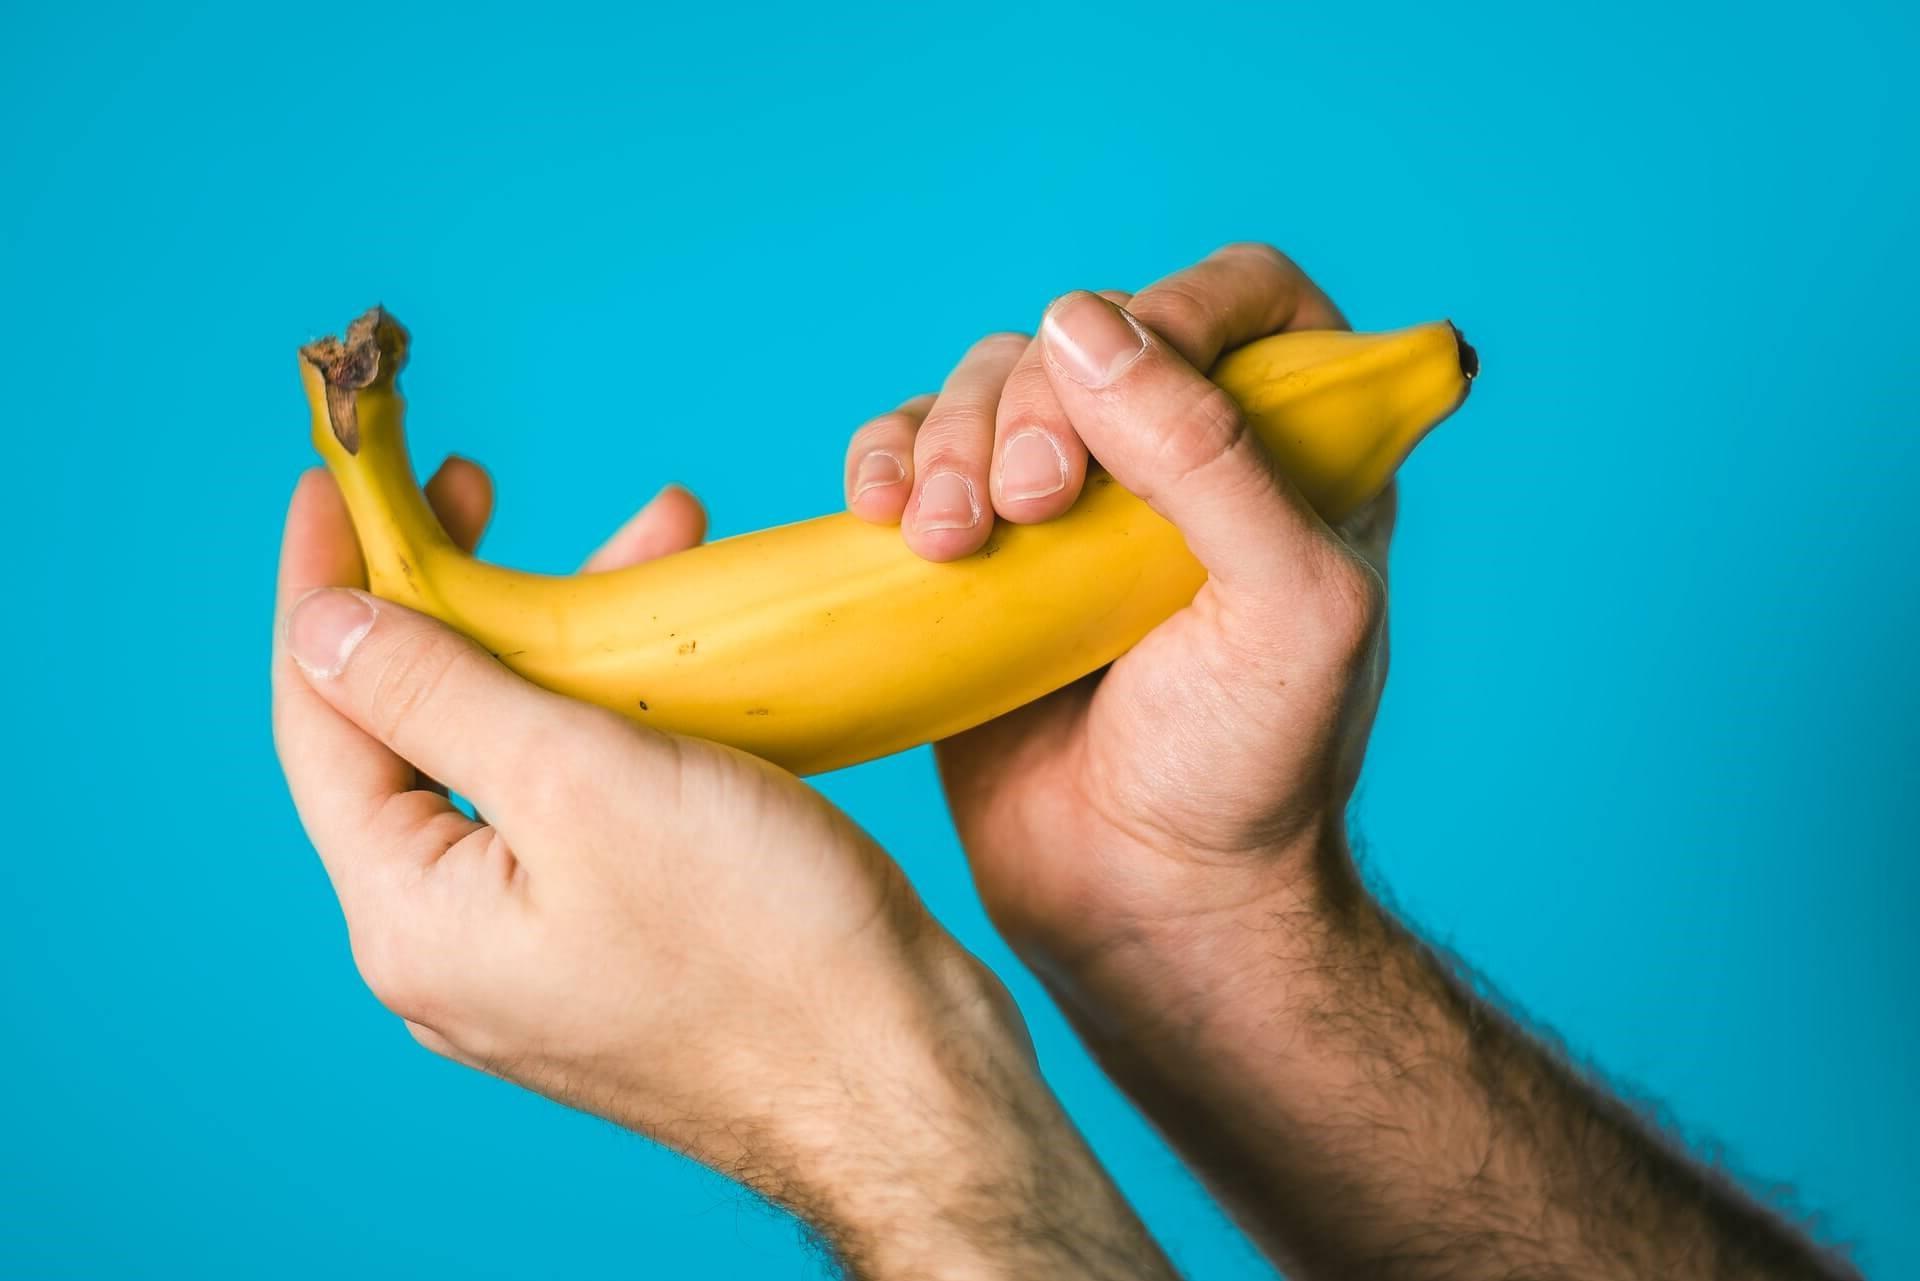 Man Holding Banana Referring to Penis Size